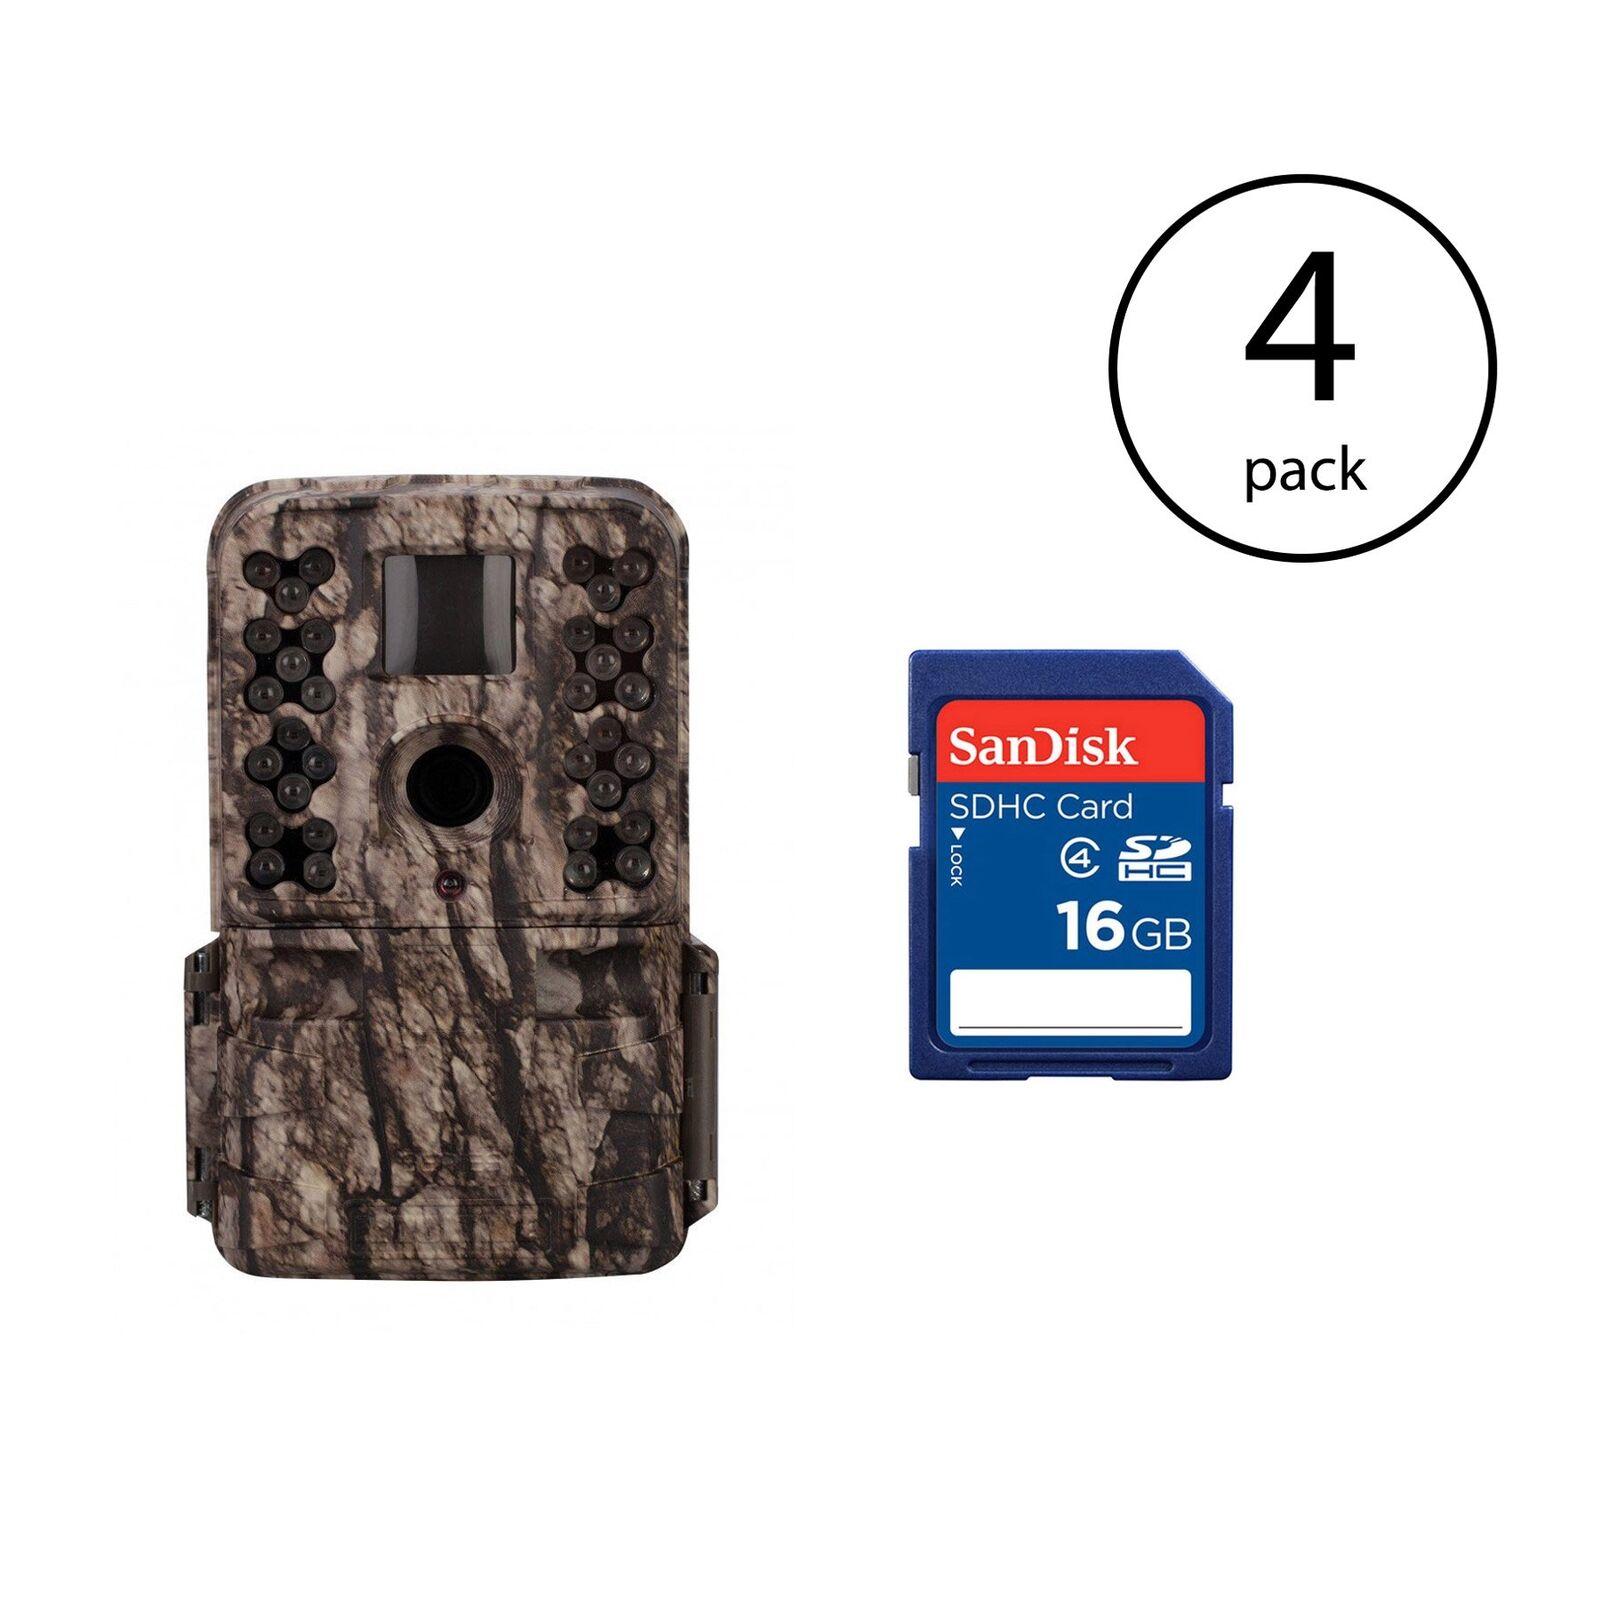 Moultrie M-50 20MP Juego De Infrarrojos Cámara Trail (4 Pack) + Tarjeta SD de 16GB (4 Pack)